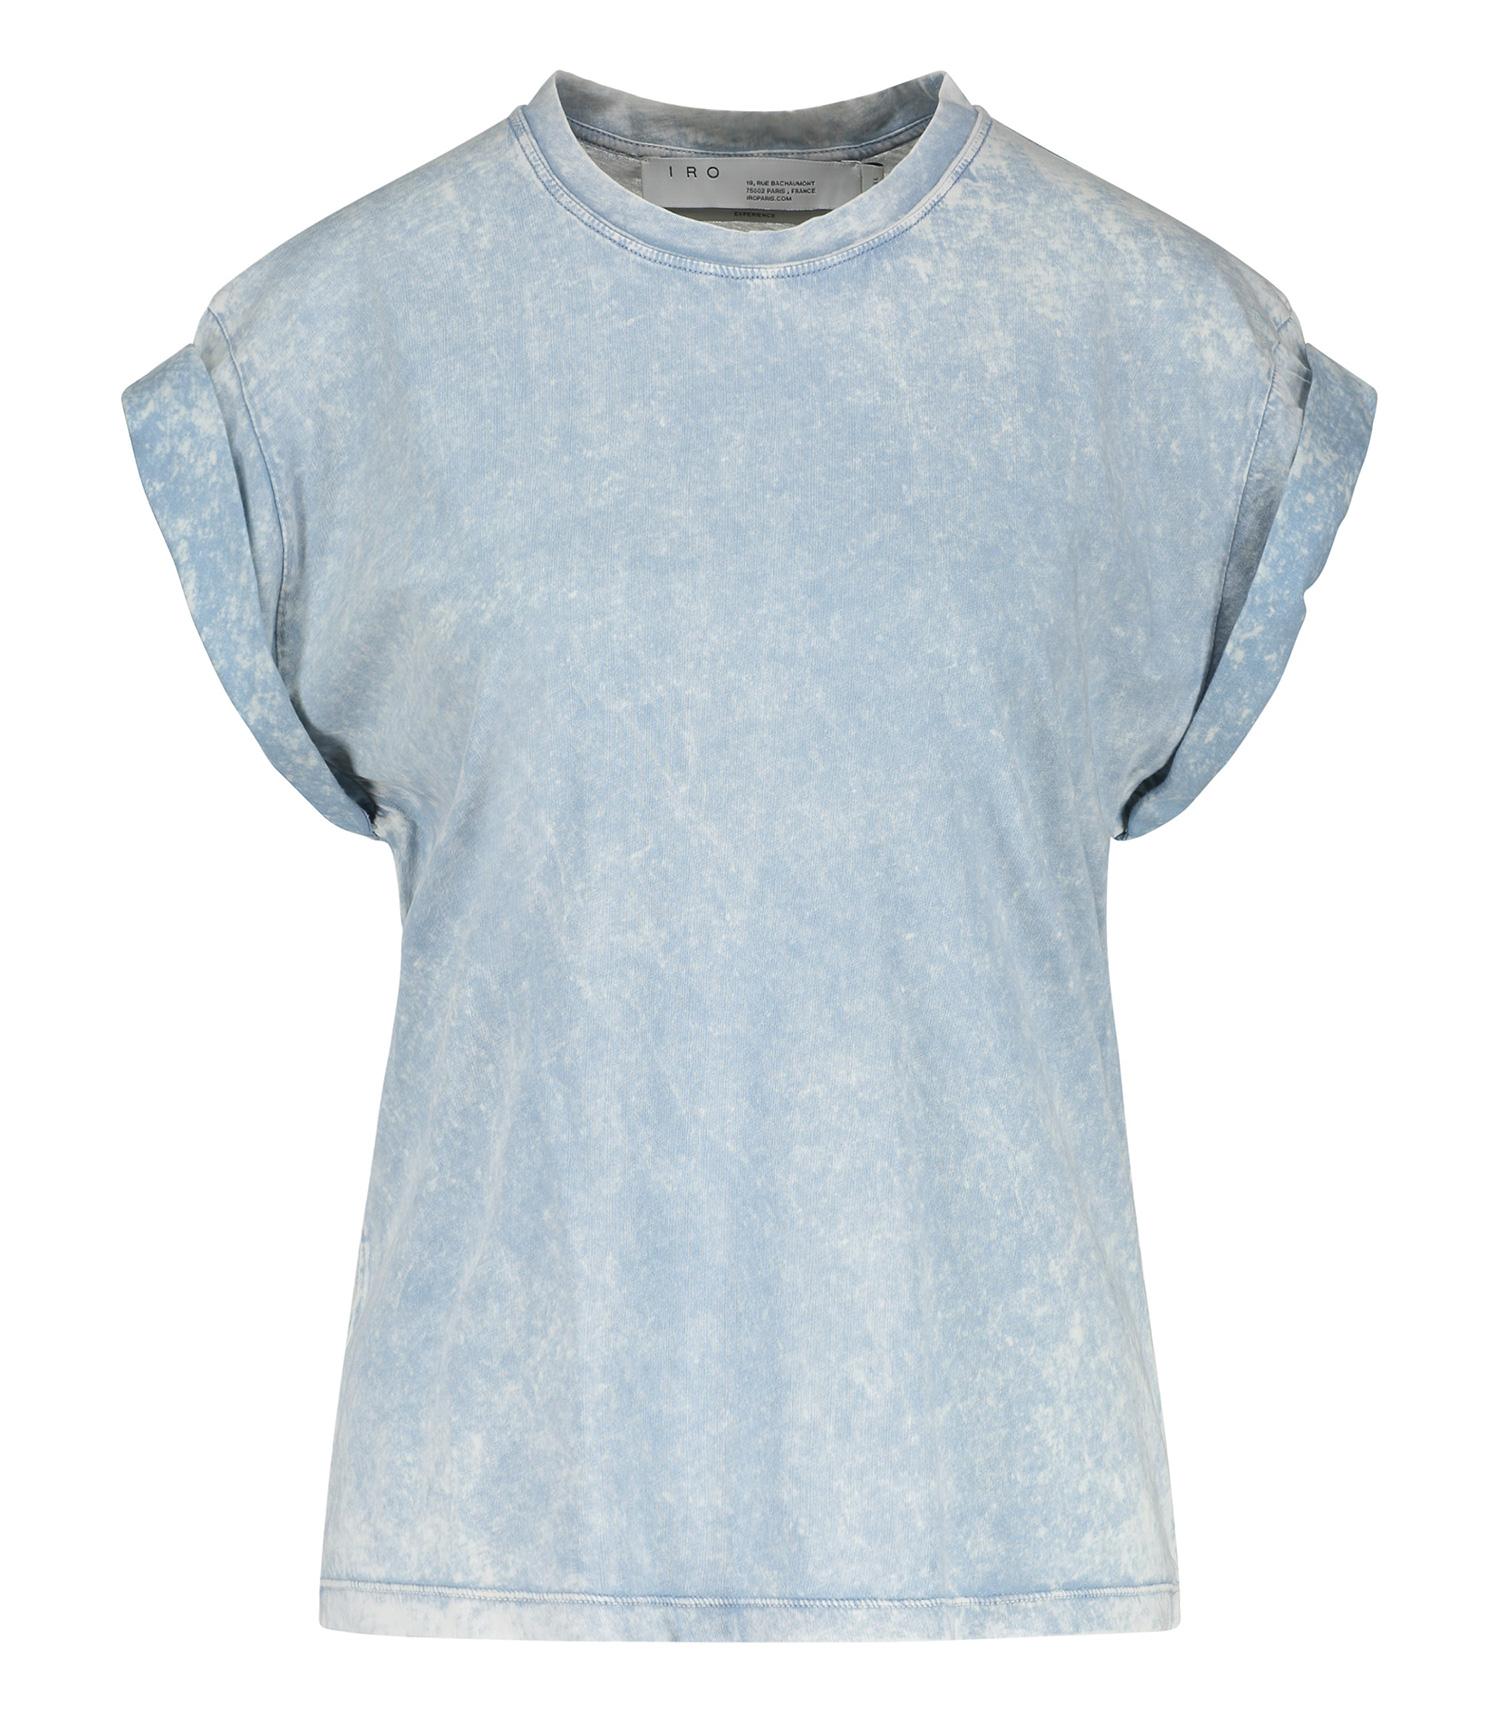 Tee shirt Castle